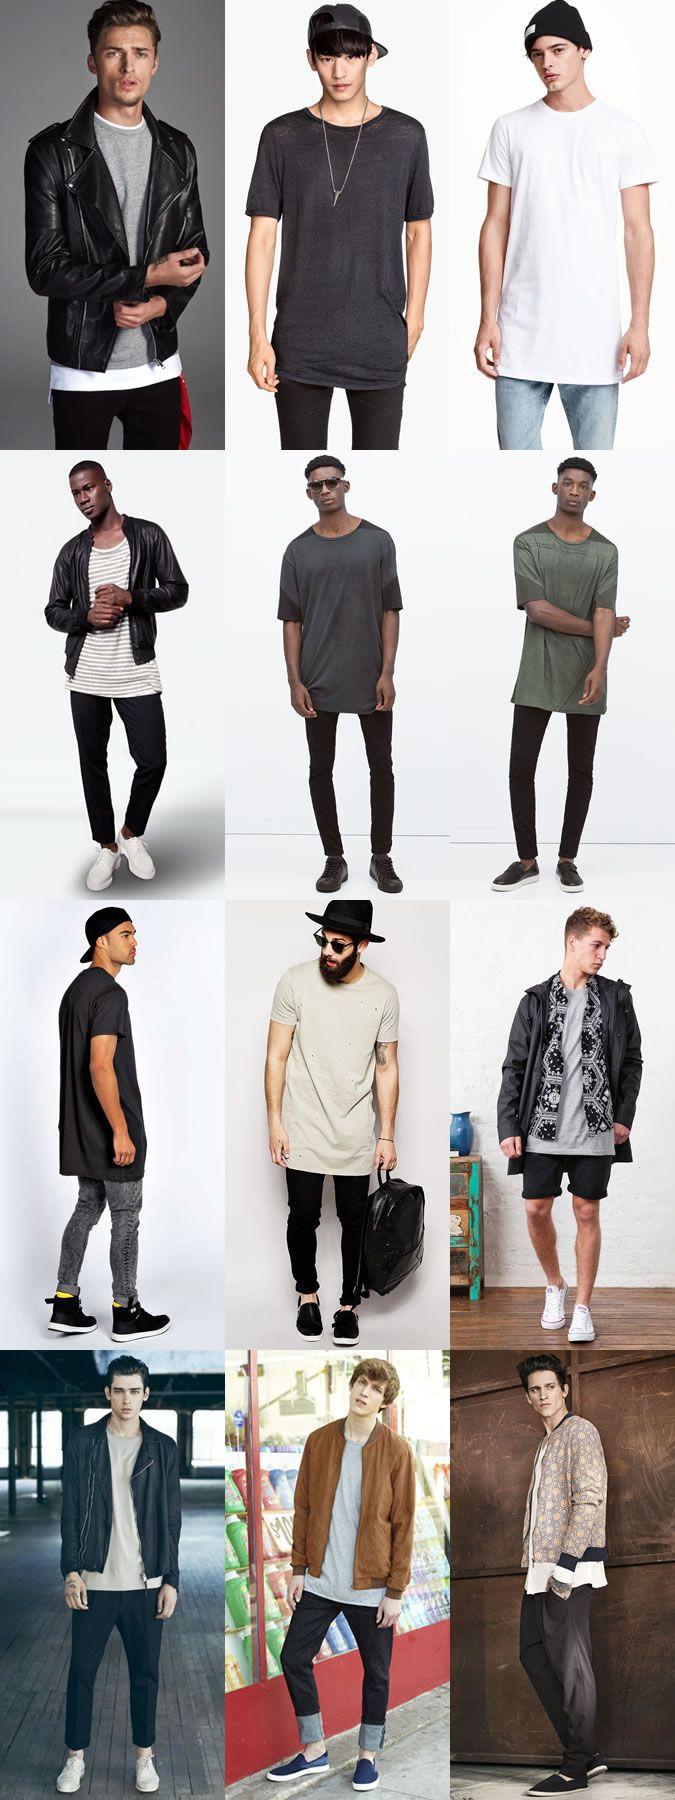 Men's Longline T-Shirts Outfit Inspiration Lookbook